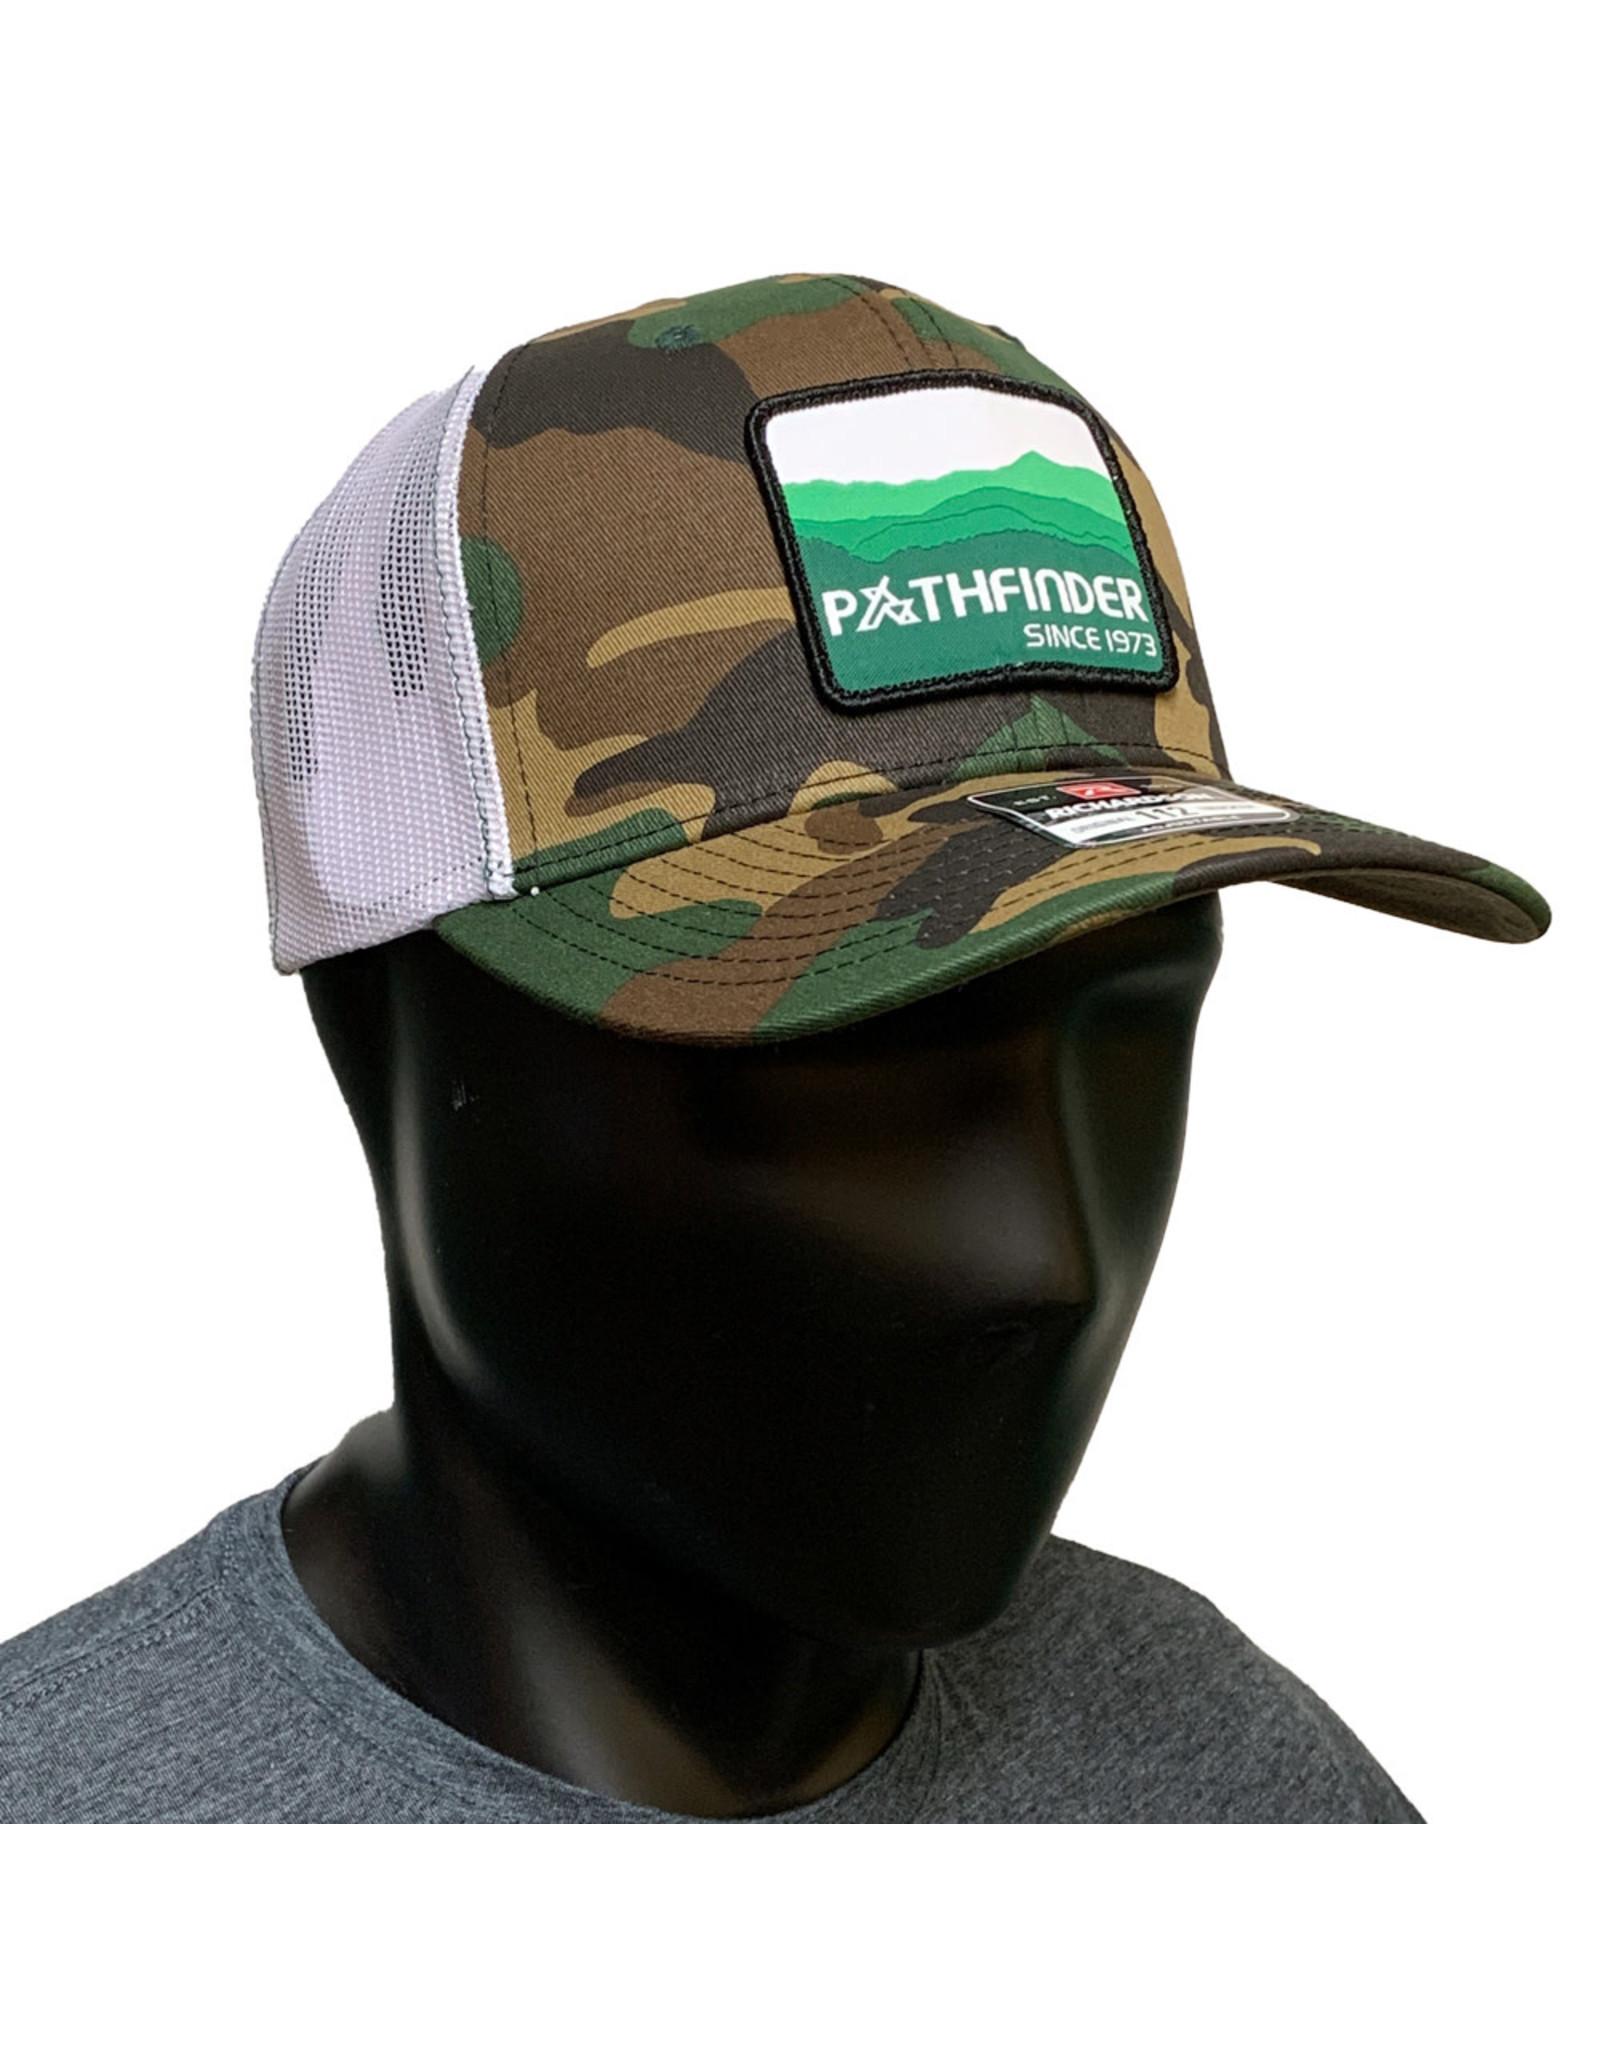 Pathfinder Mesh Back Trucker Green Mountains